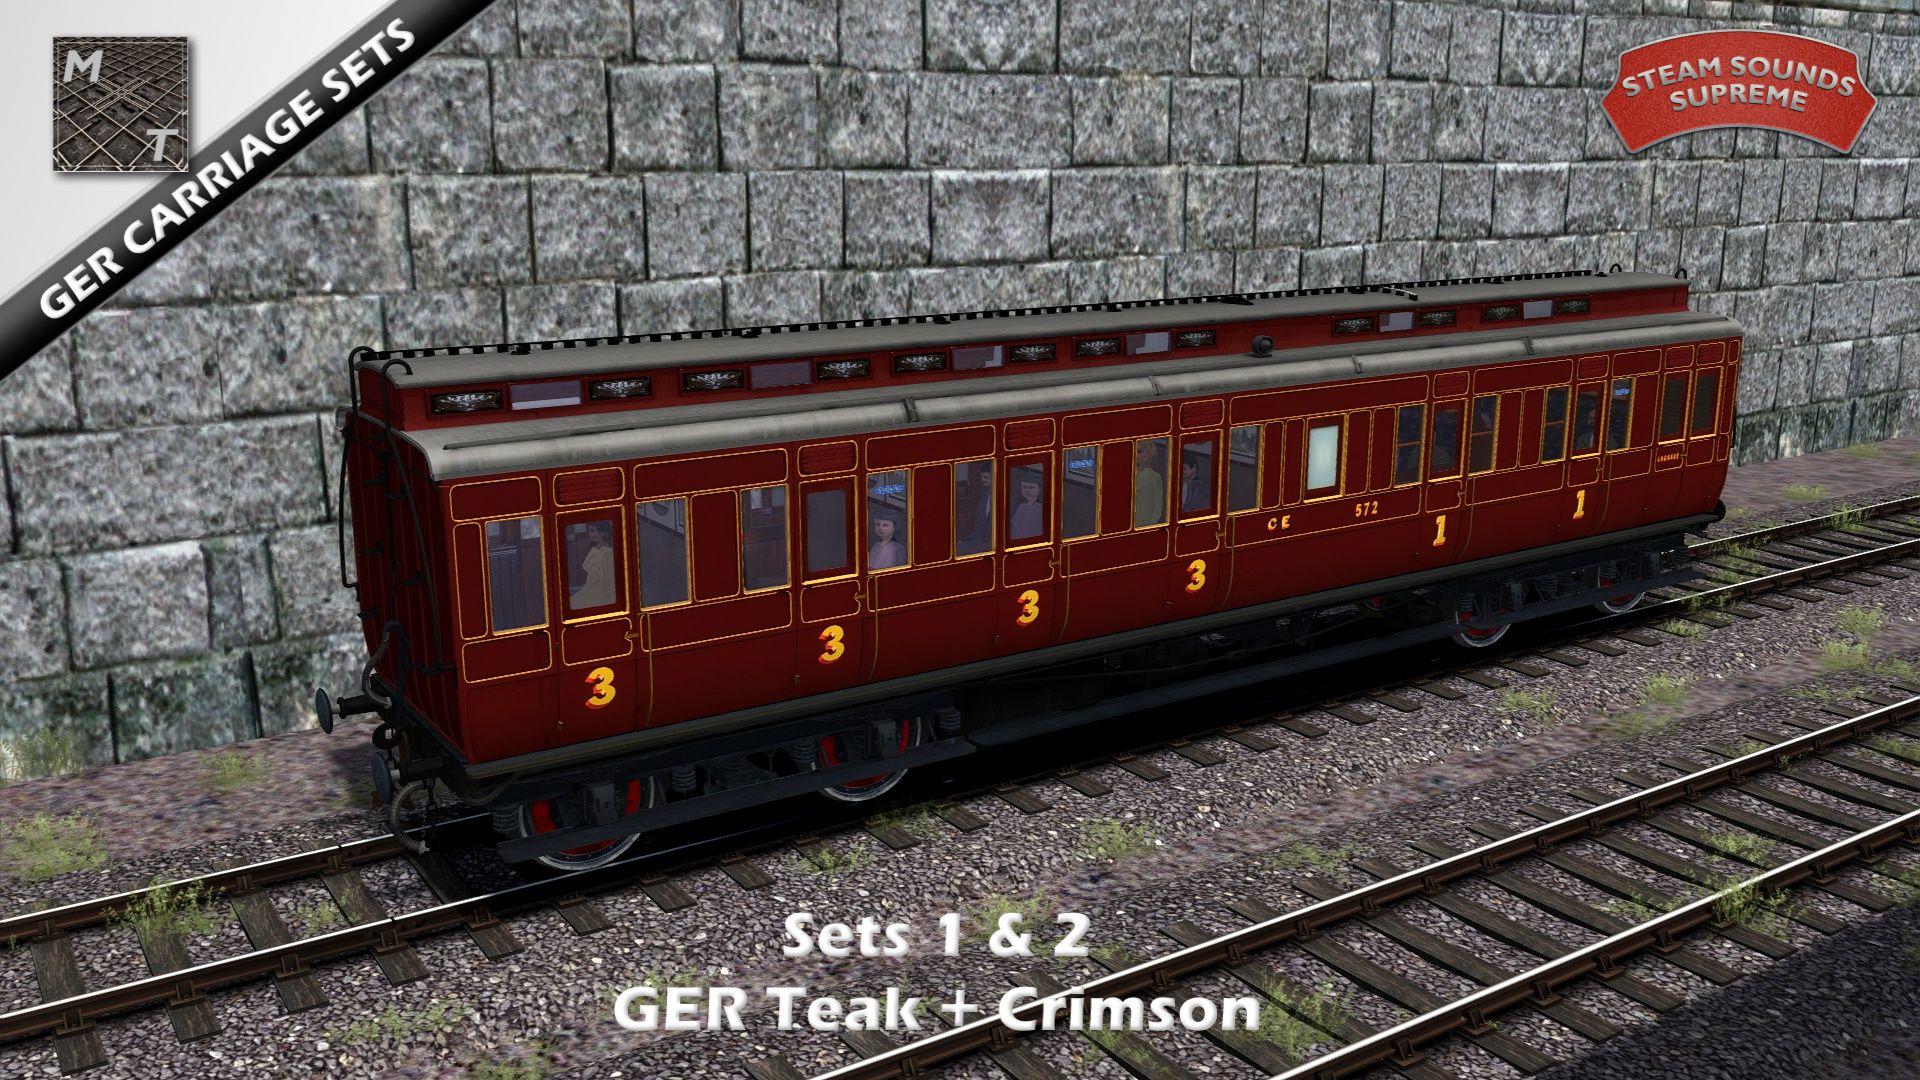 GERCorrSet1-2_23.jpg